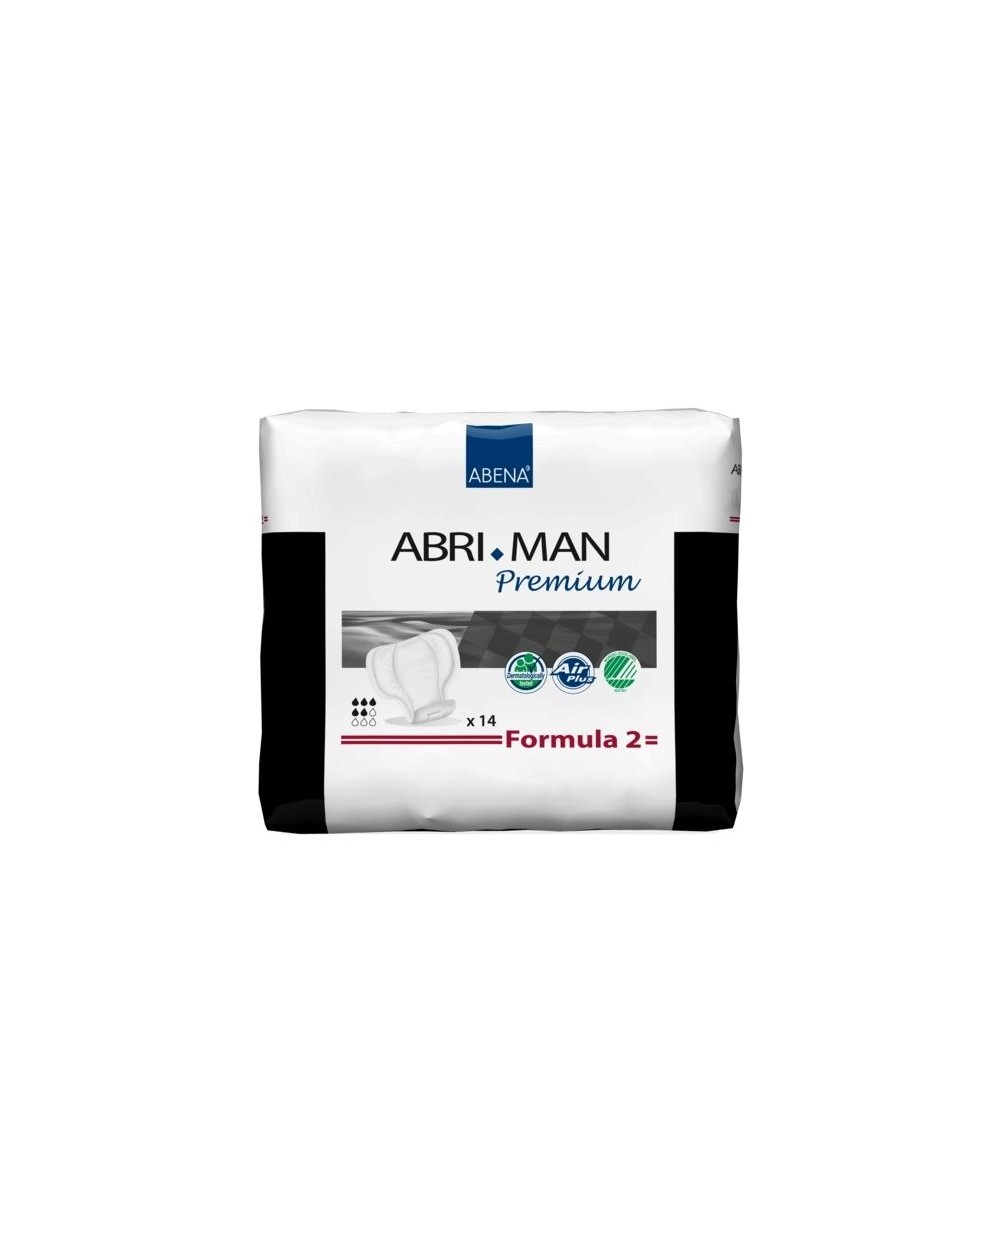 ABENA Abri-Man Formula 2 - 14 protections